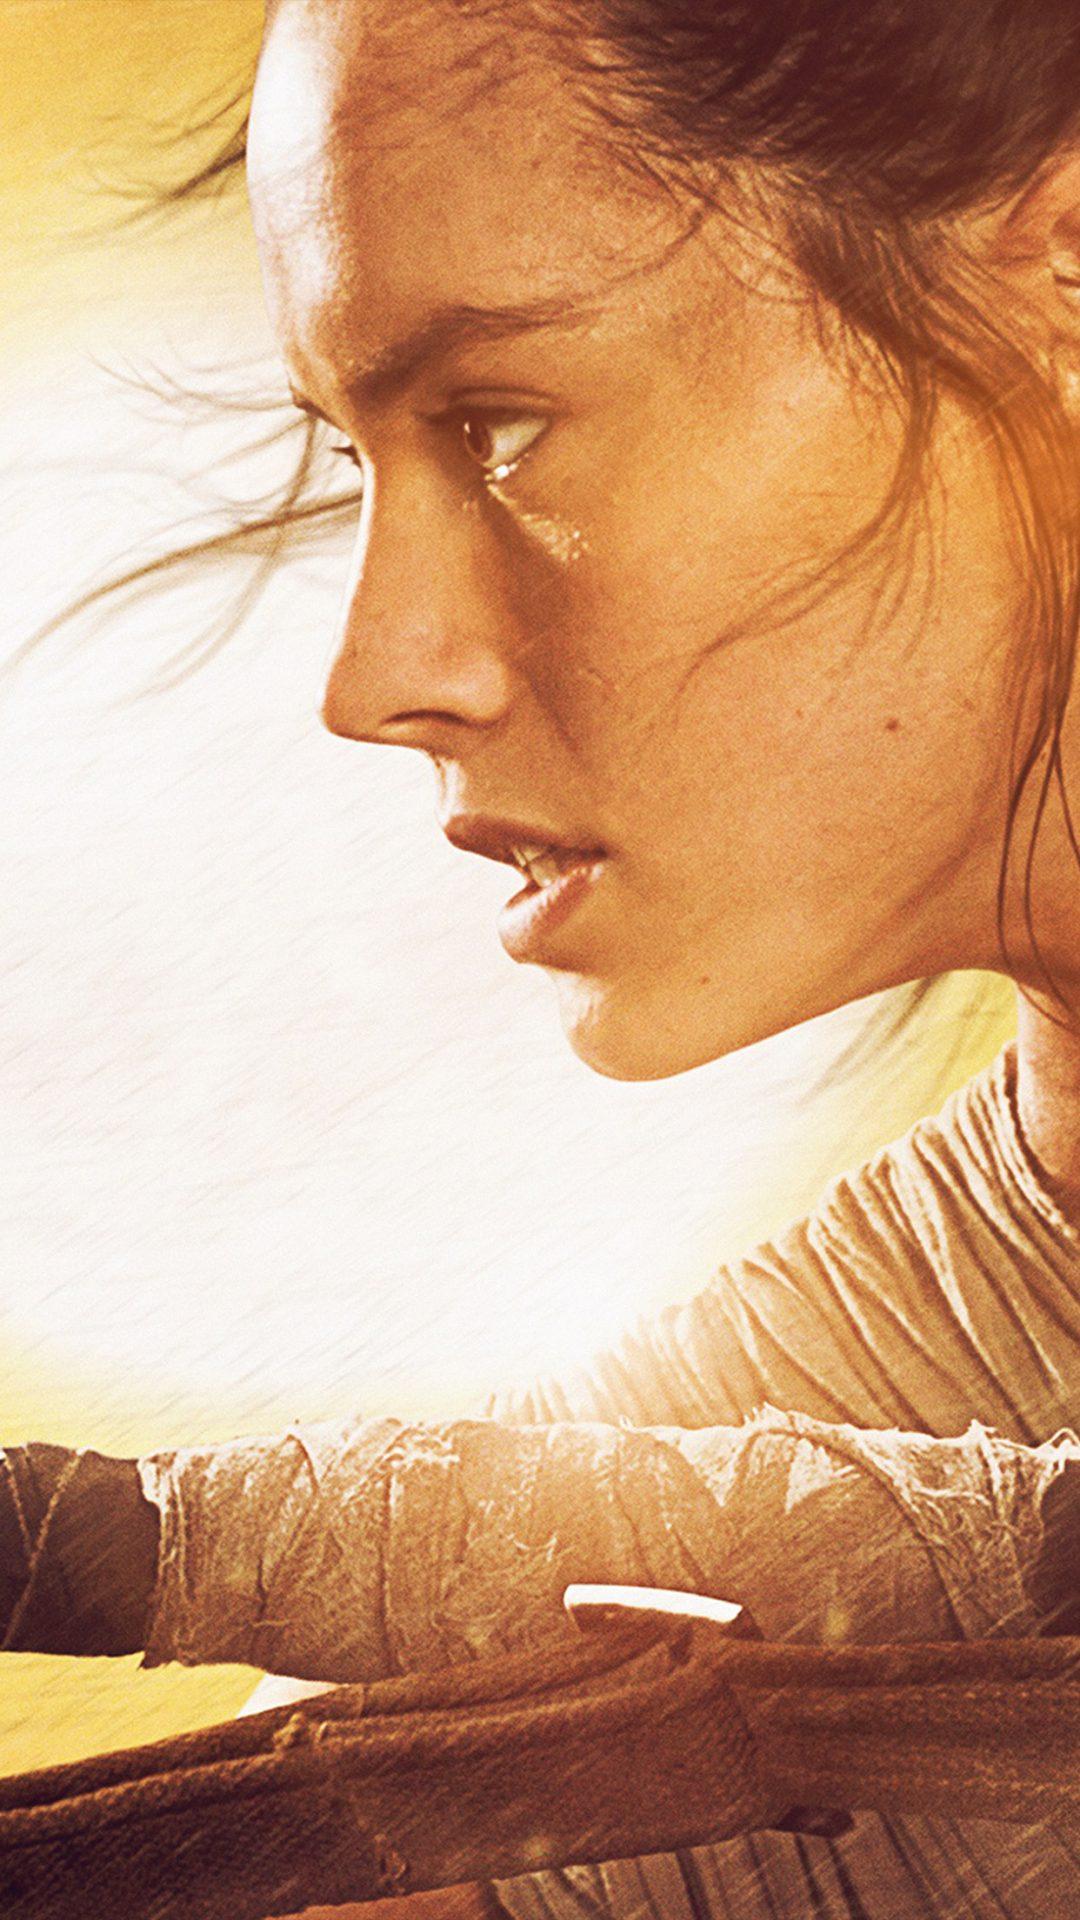 Rey Starwars Film Art Actress Love